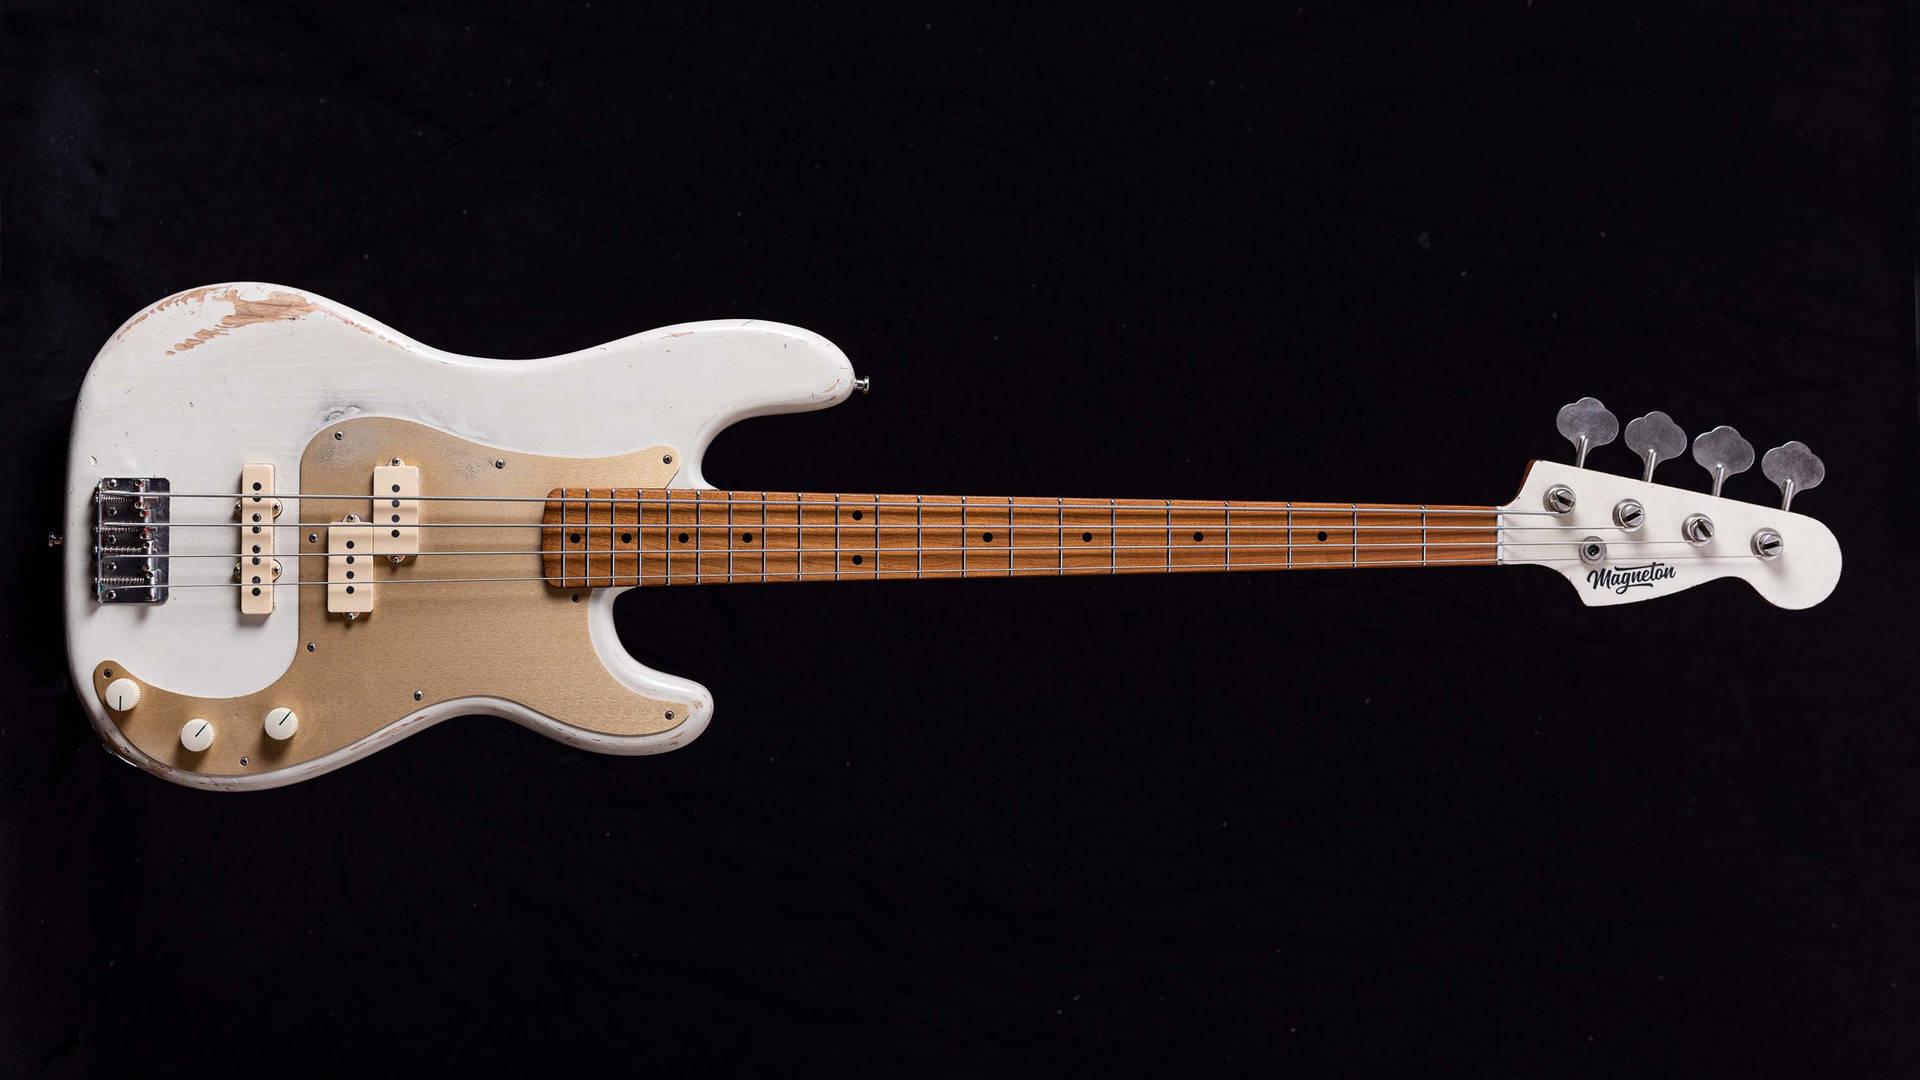 Magneton Priscilla Bass –Matt C. Nold